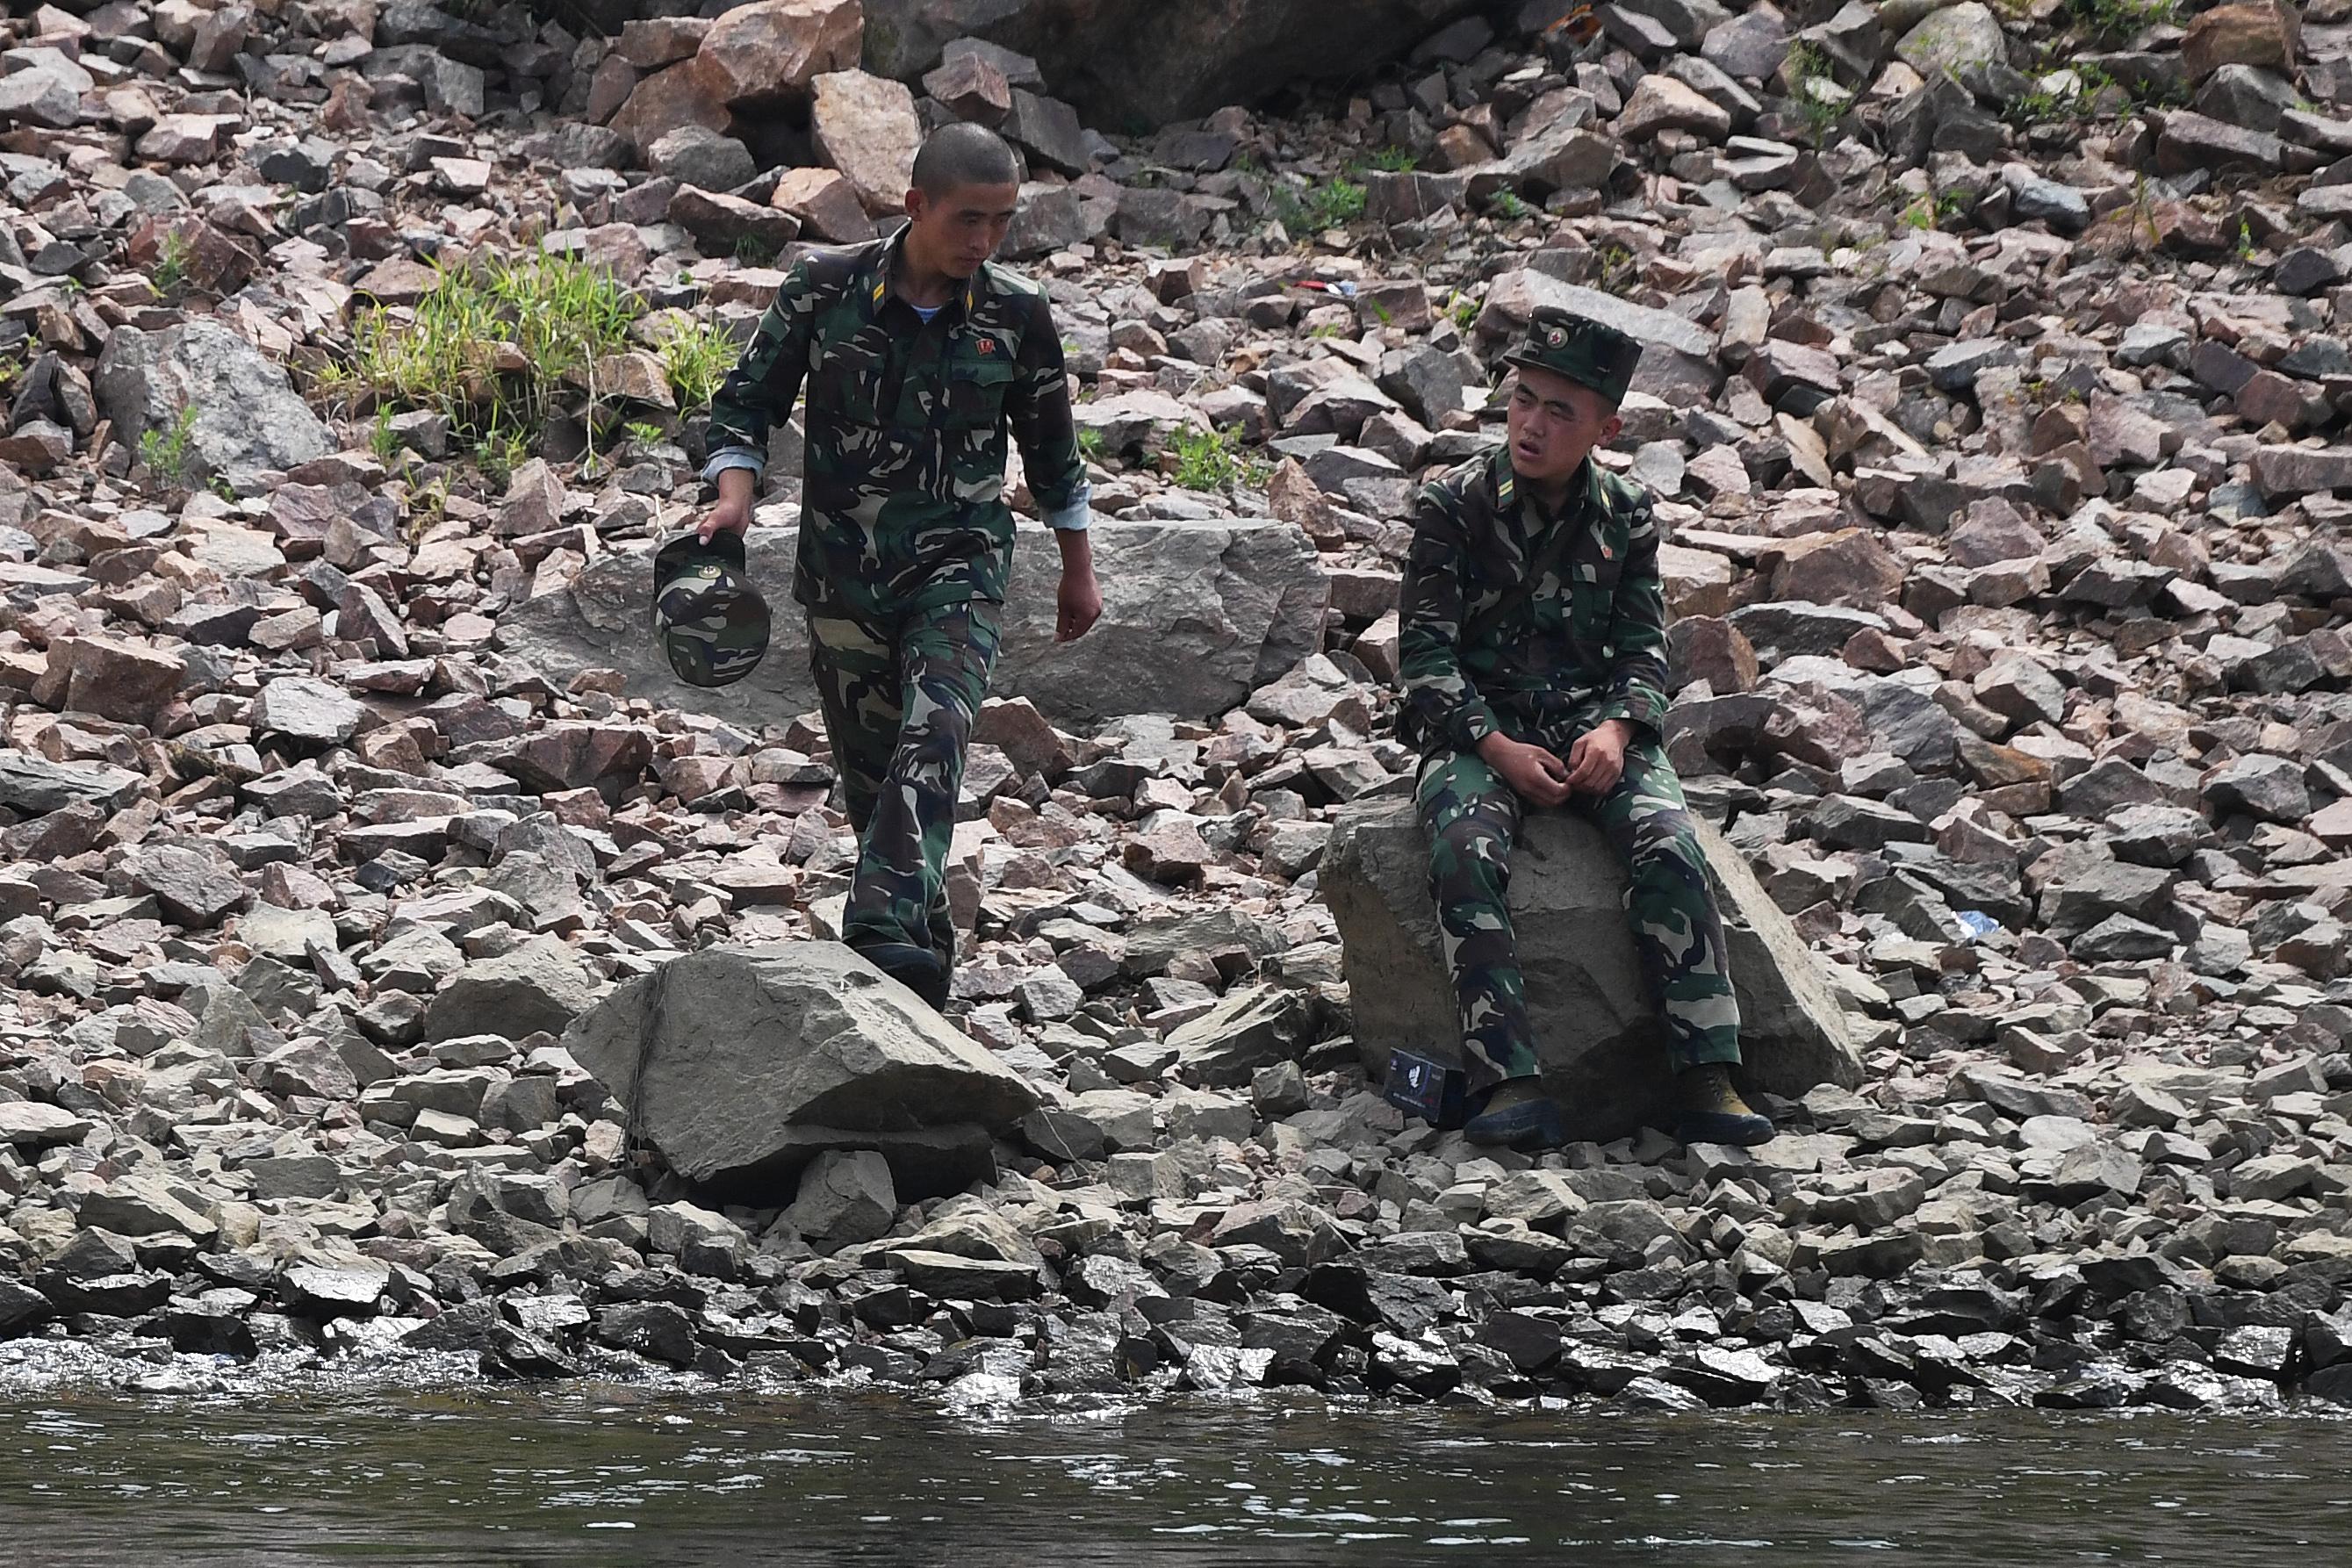 North Korea says U.S.  threats make war unavoidable as China urges calm